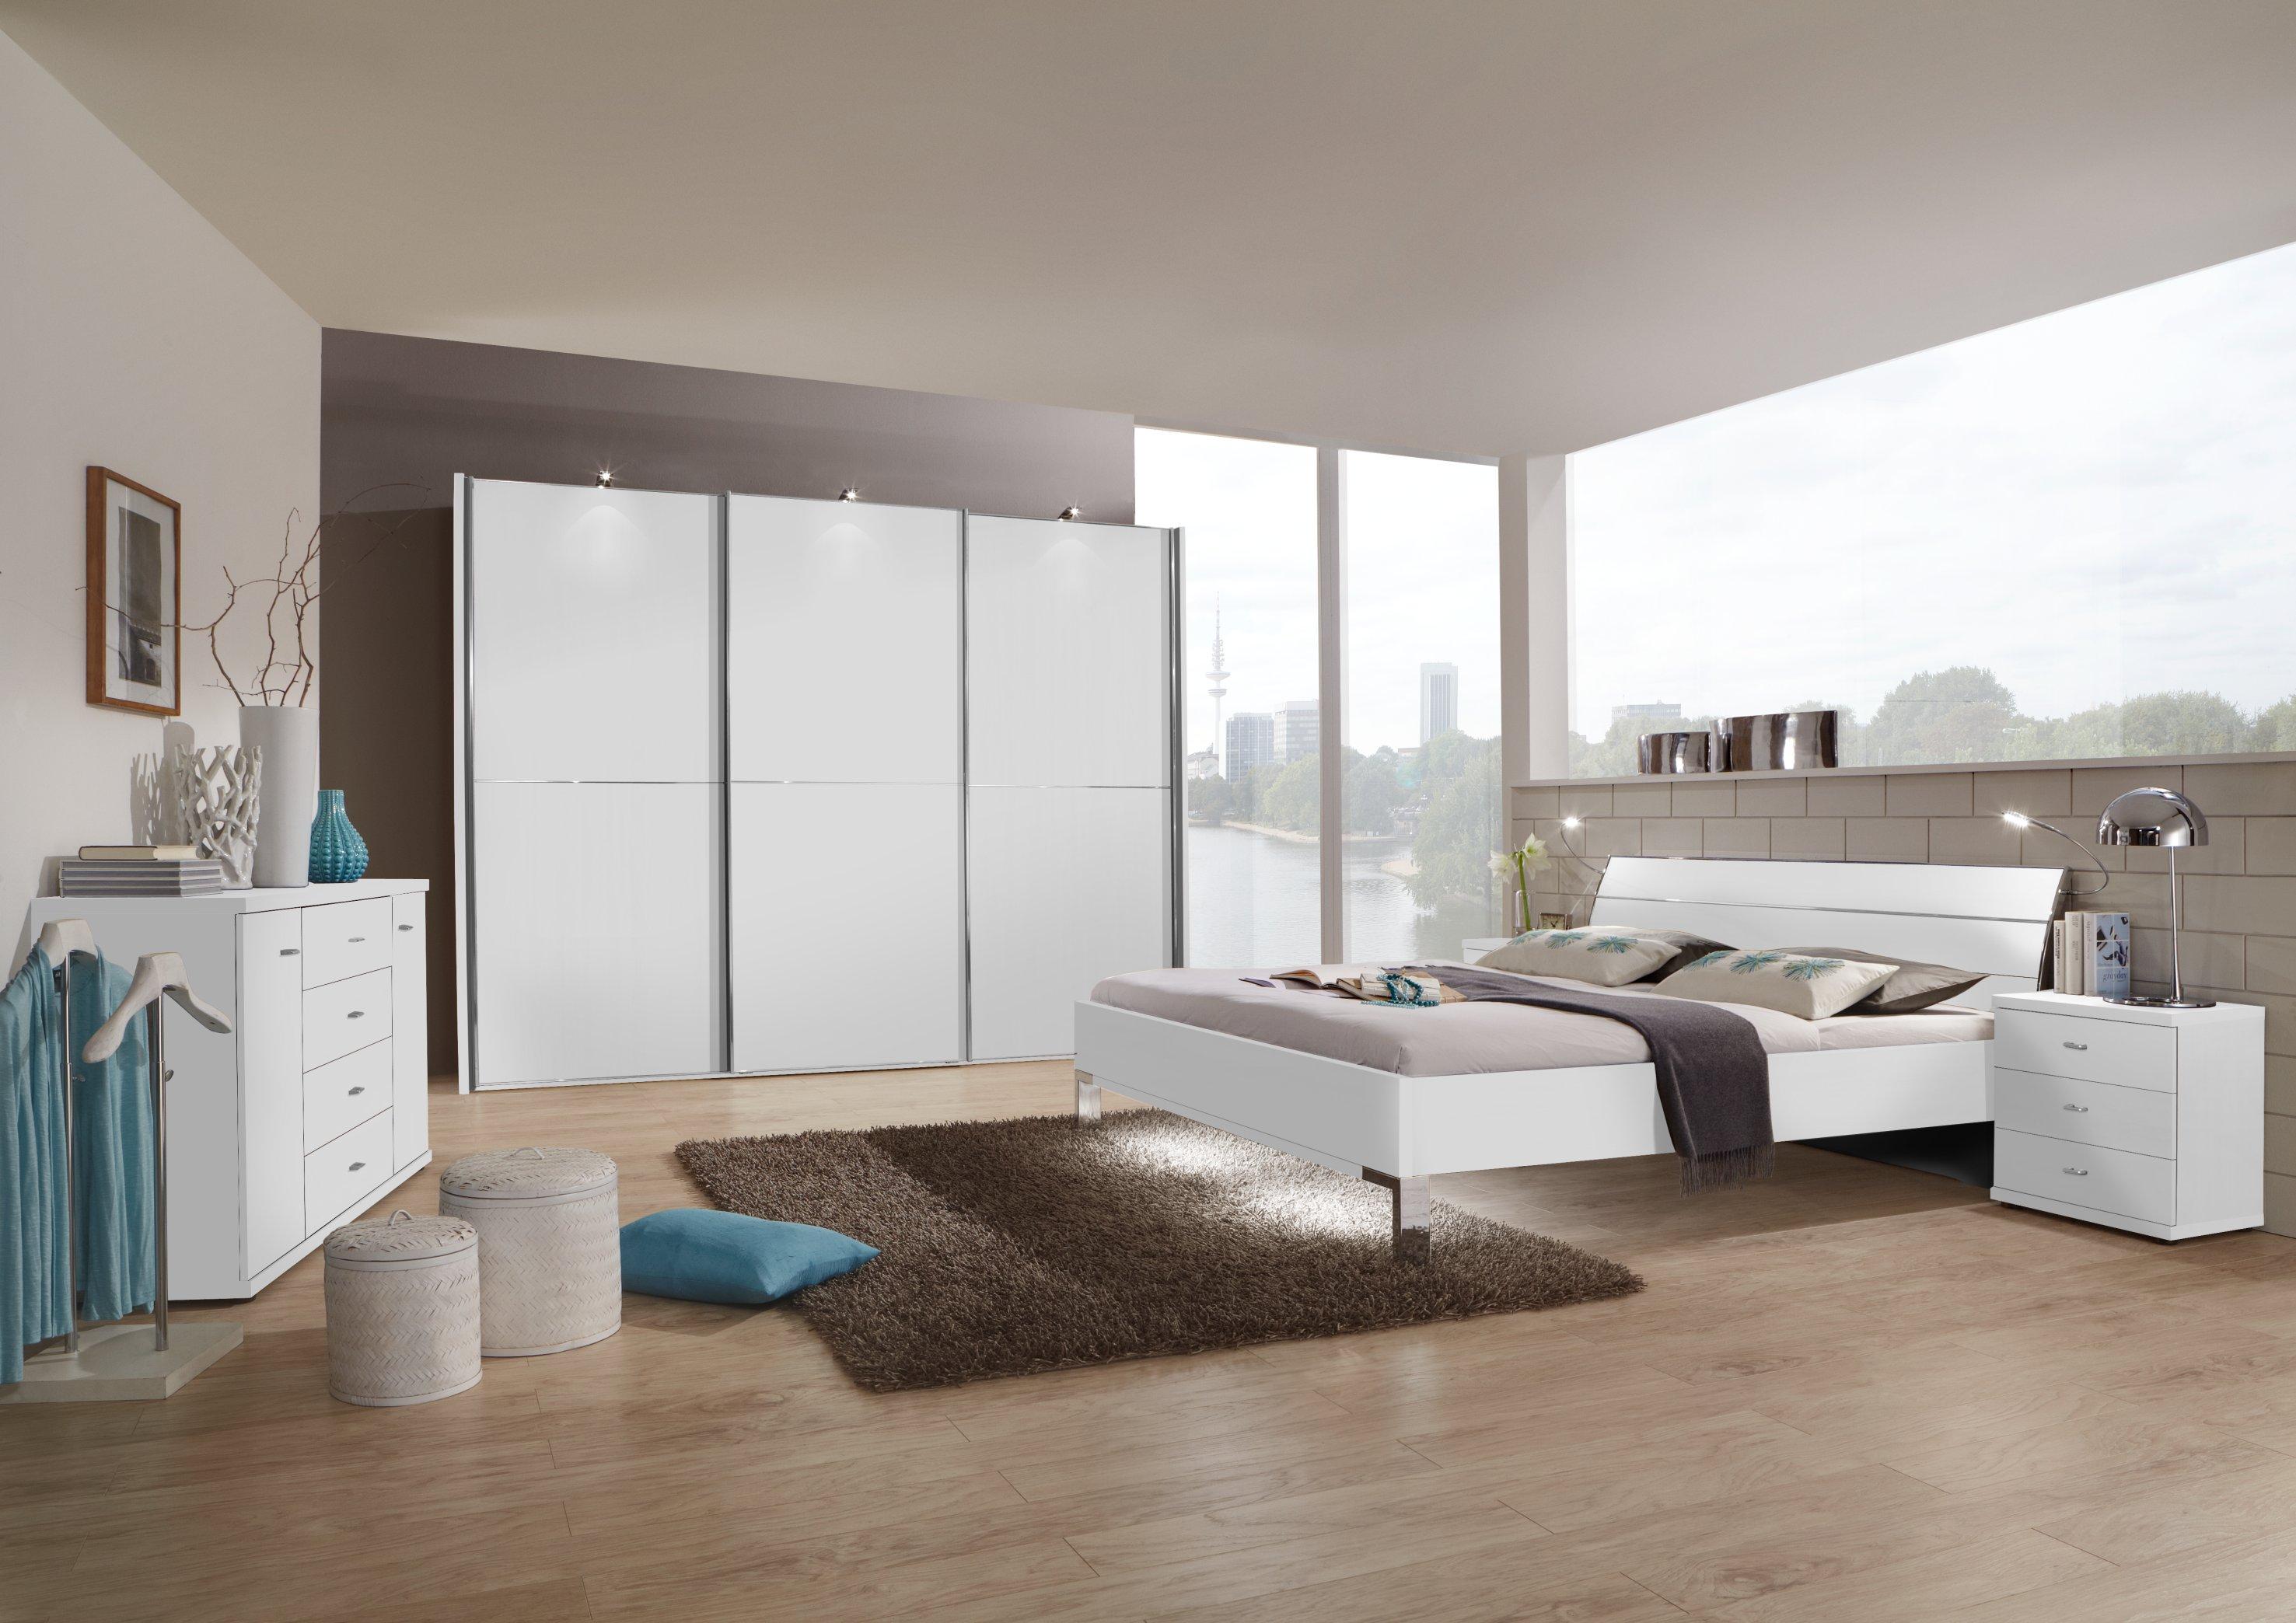 Miami 2   Bedrooms & Wardrobes By Wiemann Uk